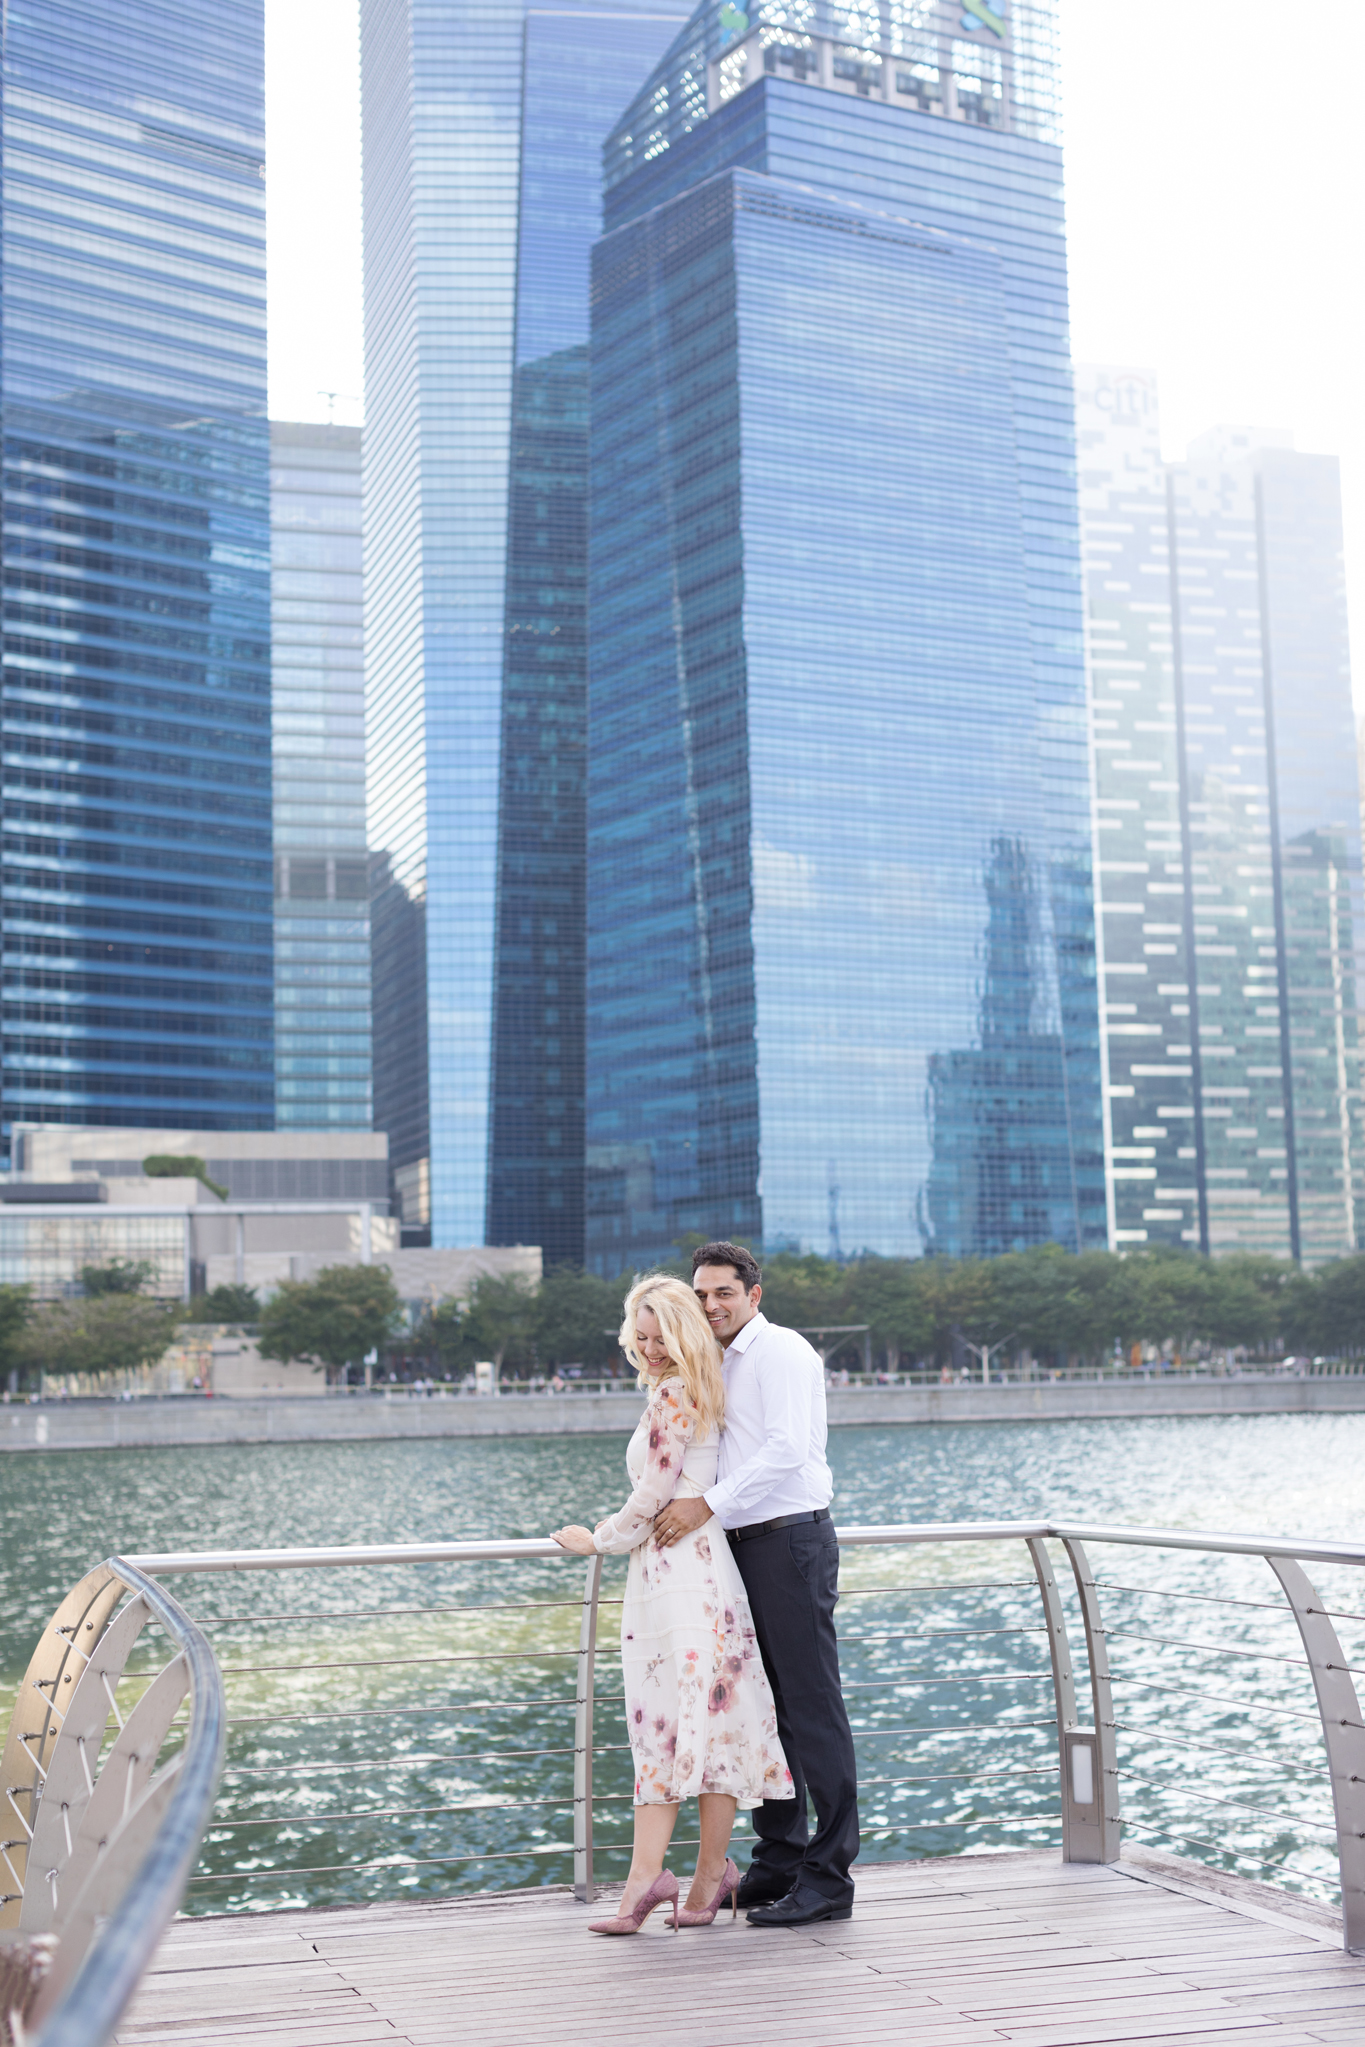 marina-bay-sands- couple-photoshoot-family-photographer-singapore-natural-light-photographer-candid-authentic-svensk-fotograf-singapore best photographer in singapore